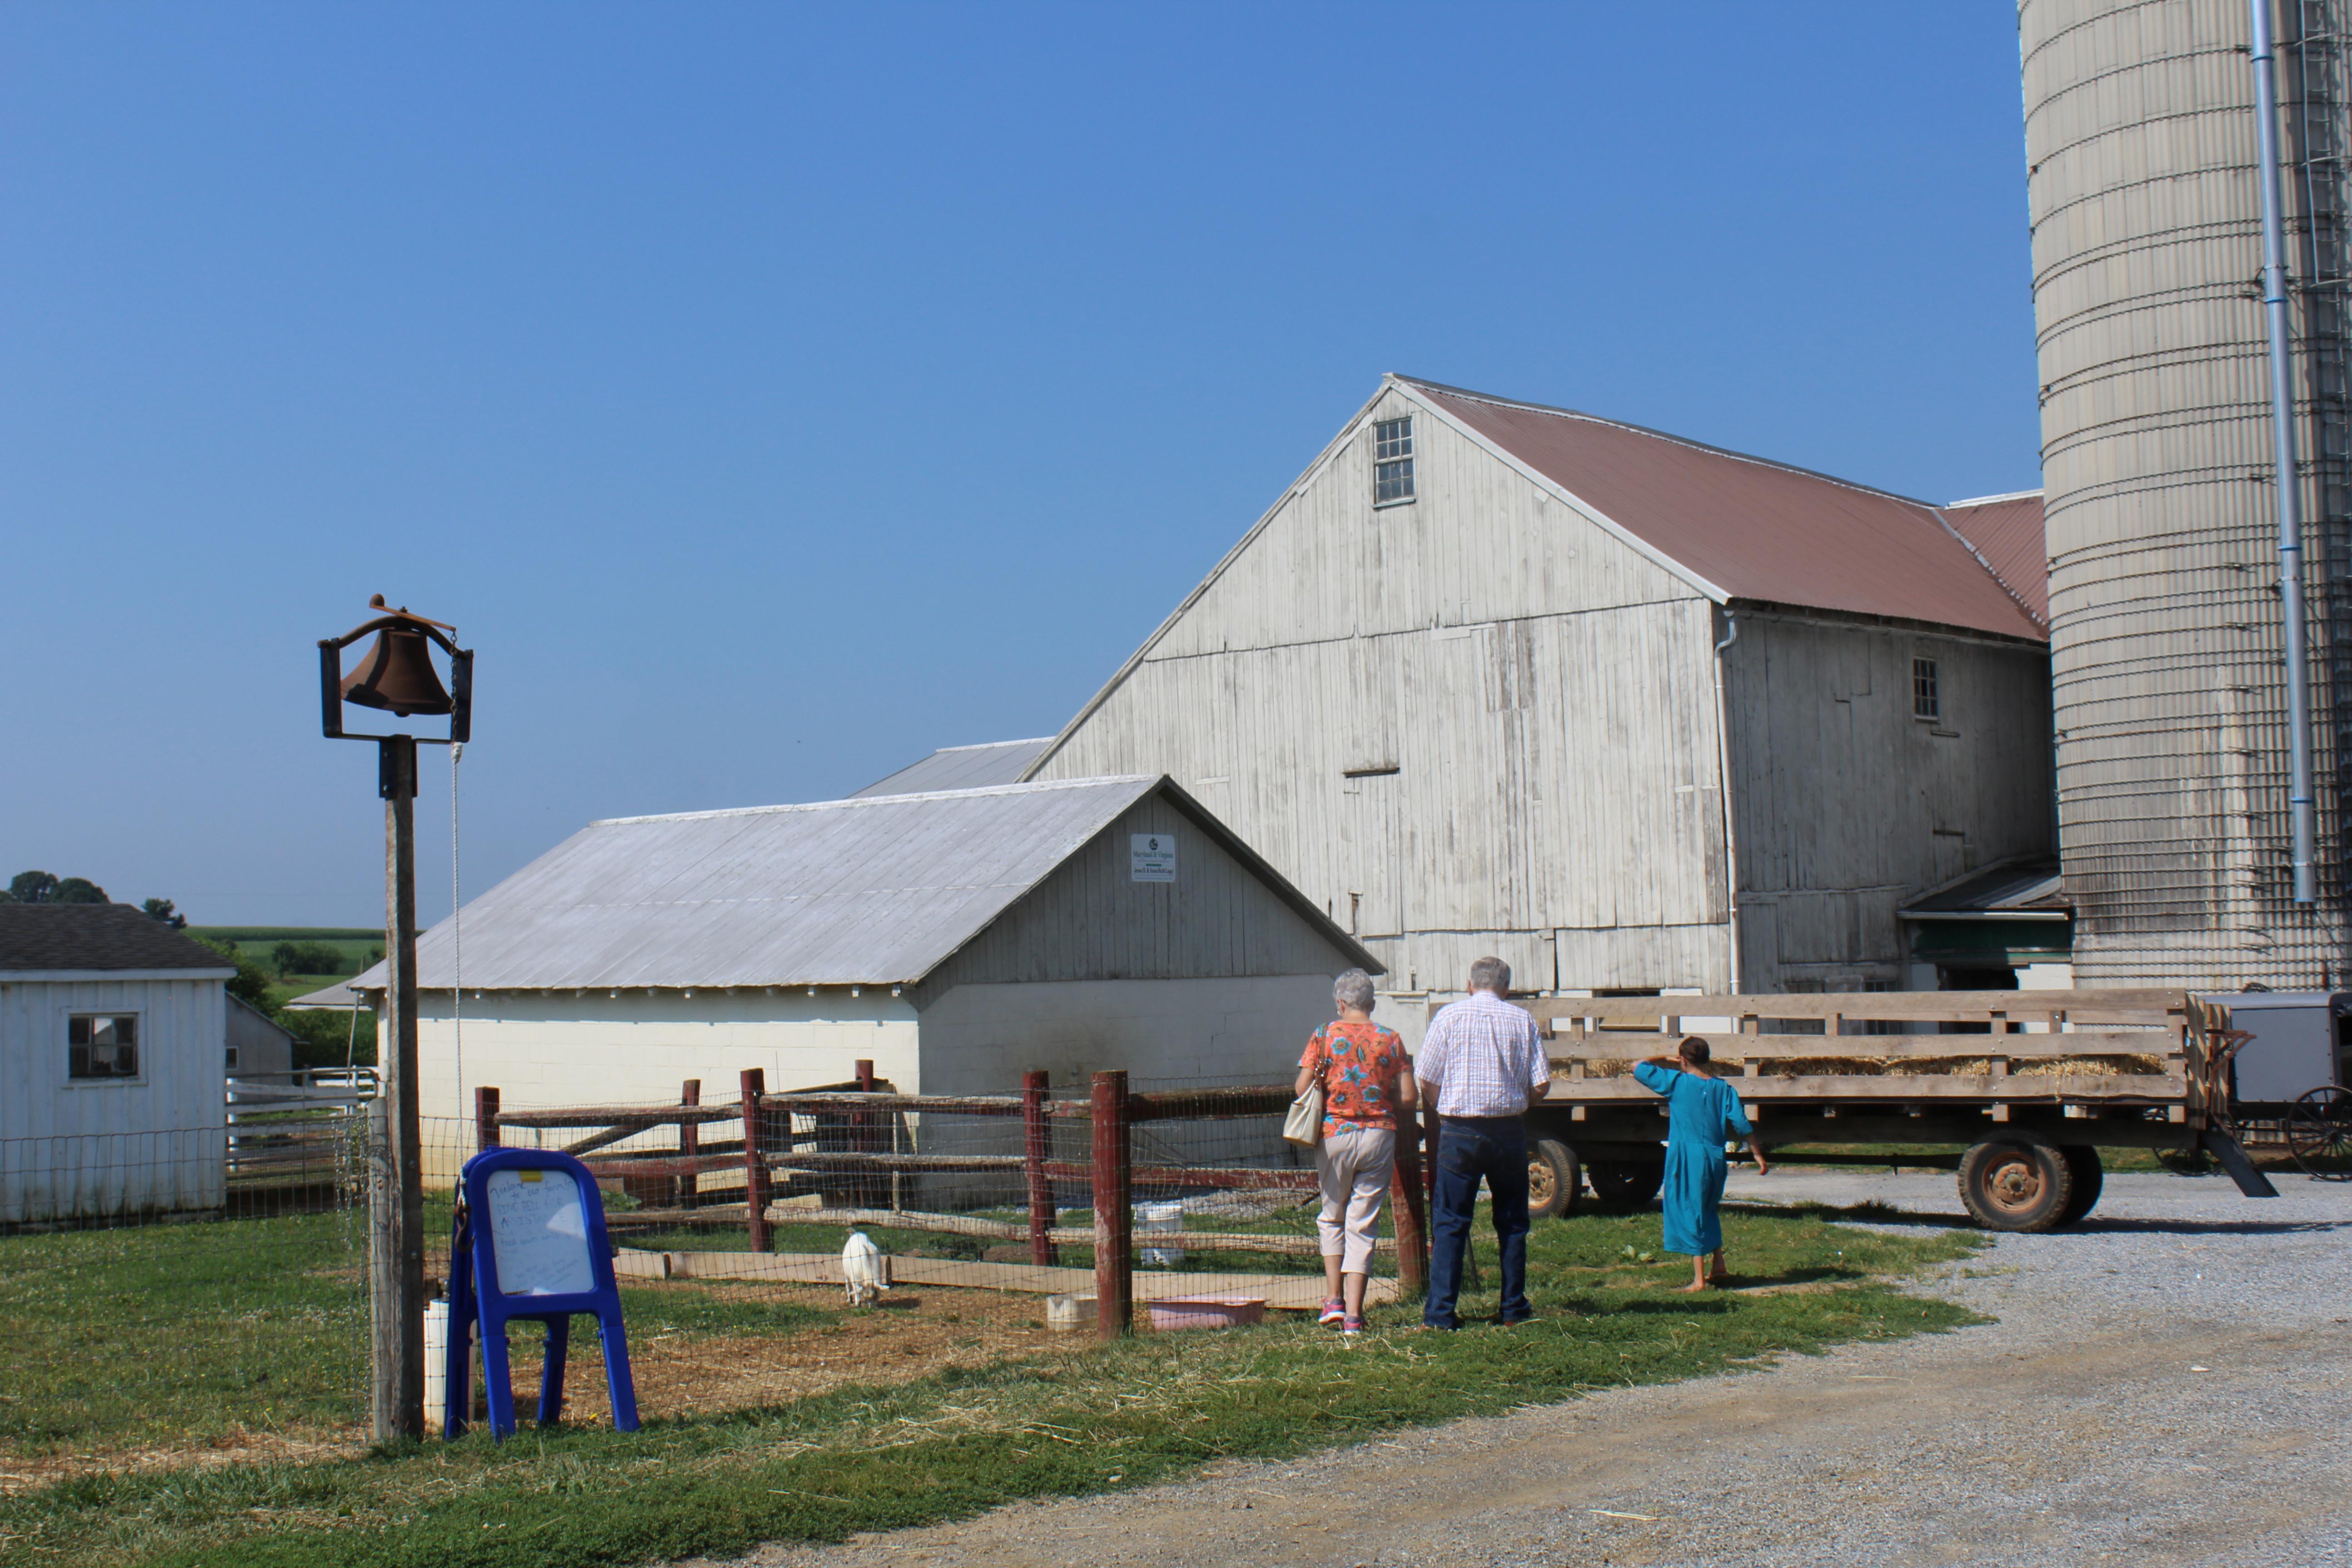 Old Windmill Amish Farm Tour Reallancastercounty Comreal